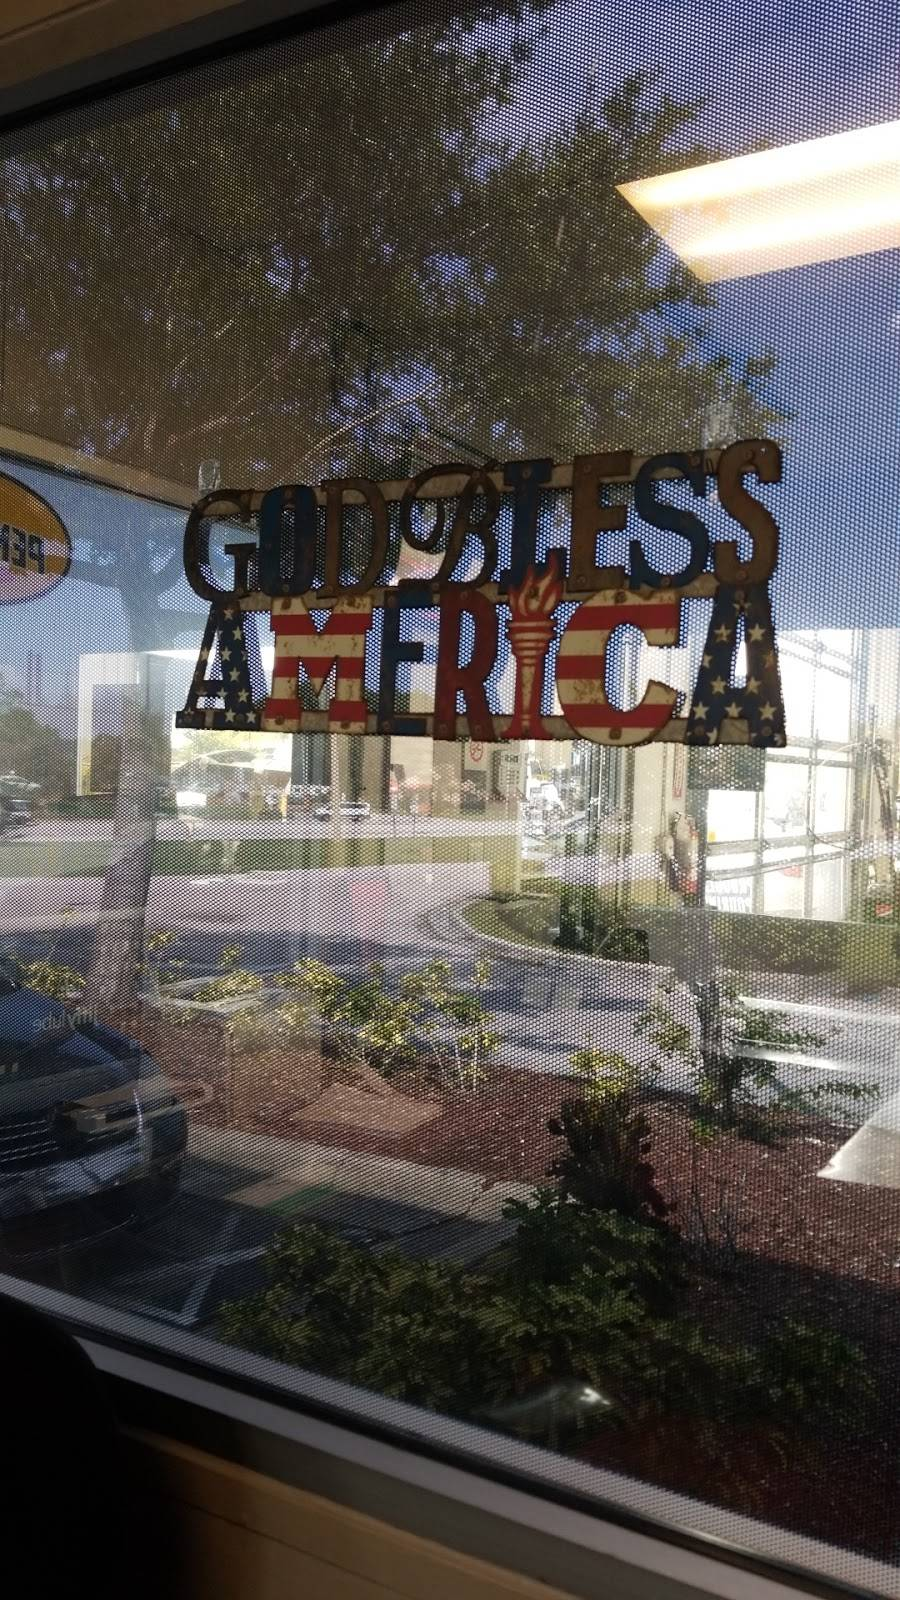 Jiffy Lube - car repair  | Photo 3 of 6 | Address: 4531 Conroy Rd, Orlando, FL 32811, USA | Phone: (407) 316-8413